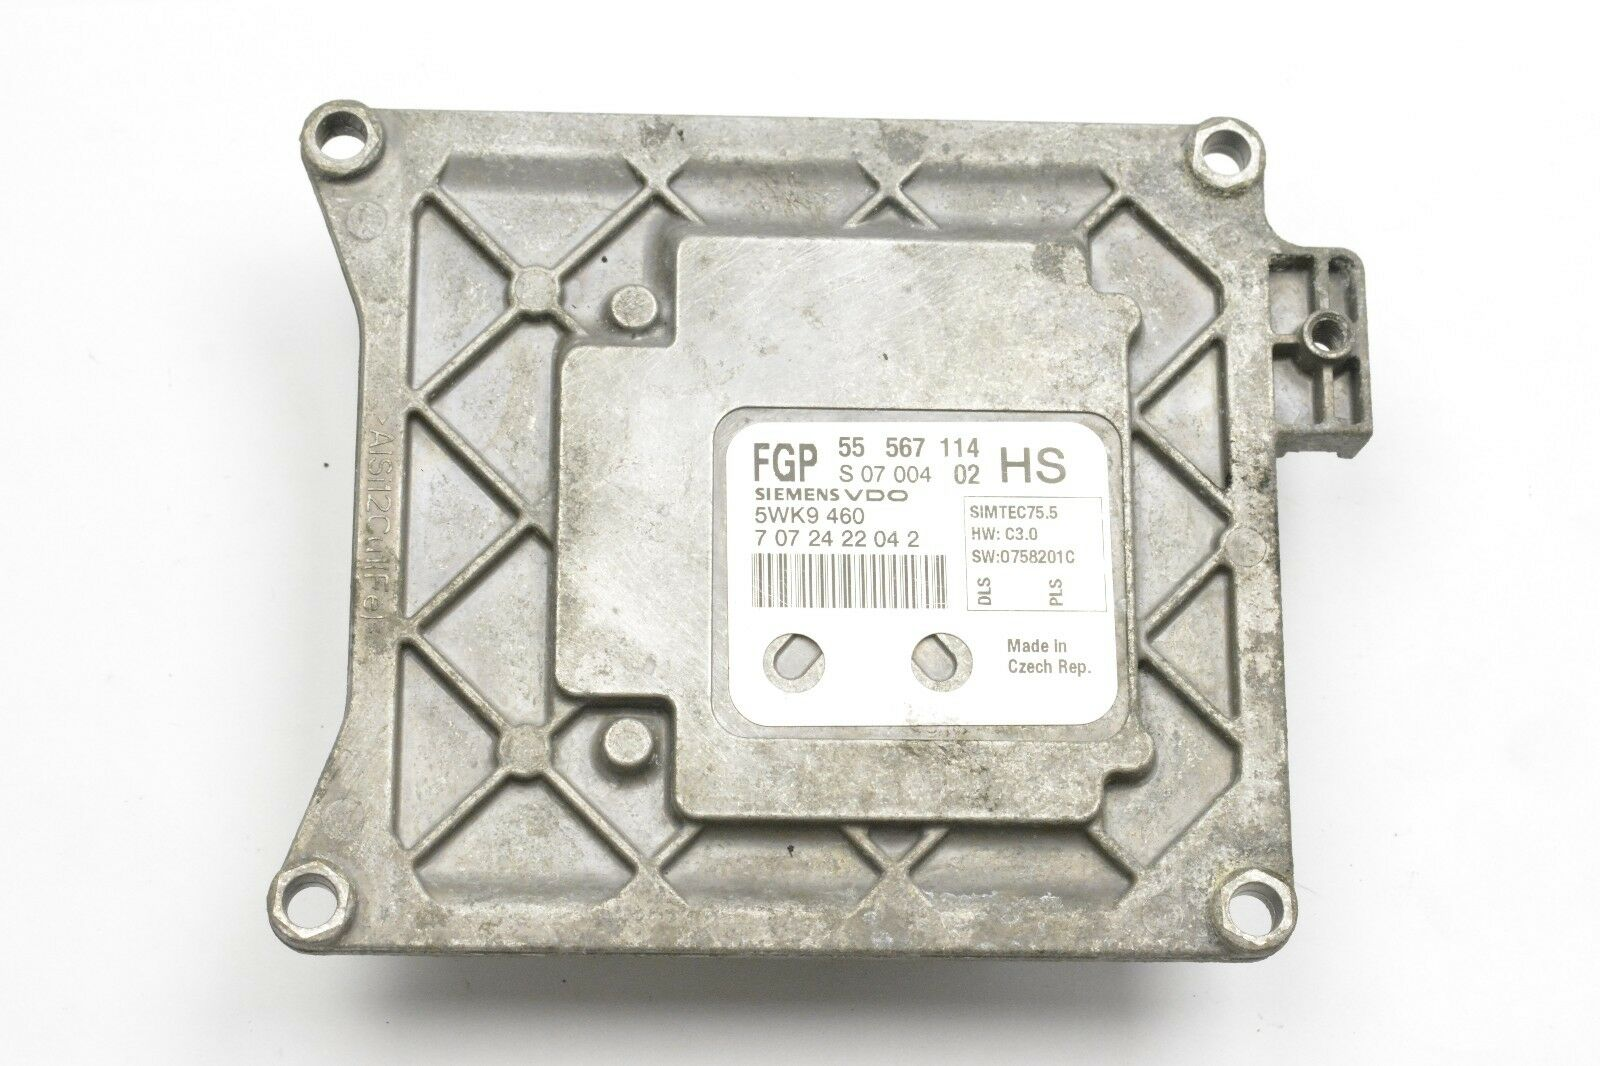 55567114 ASTRA H 1.6 ZAFIRA 5WK9460 HS VAUXHALL OPEL SIEMENS ENGINE ECU